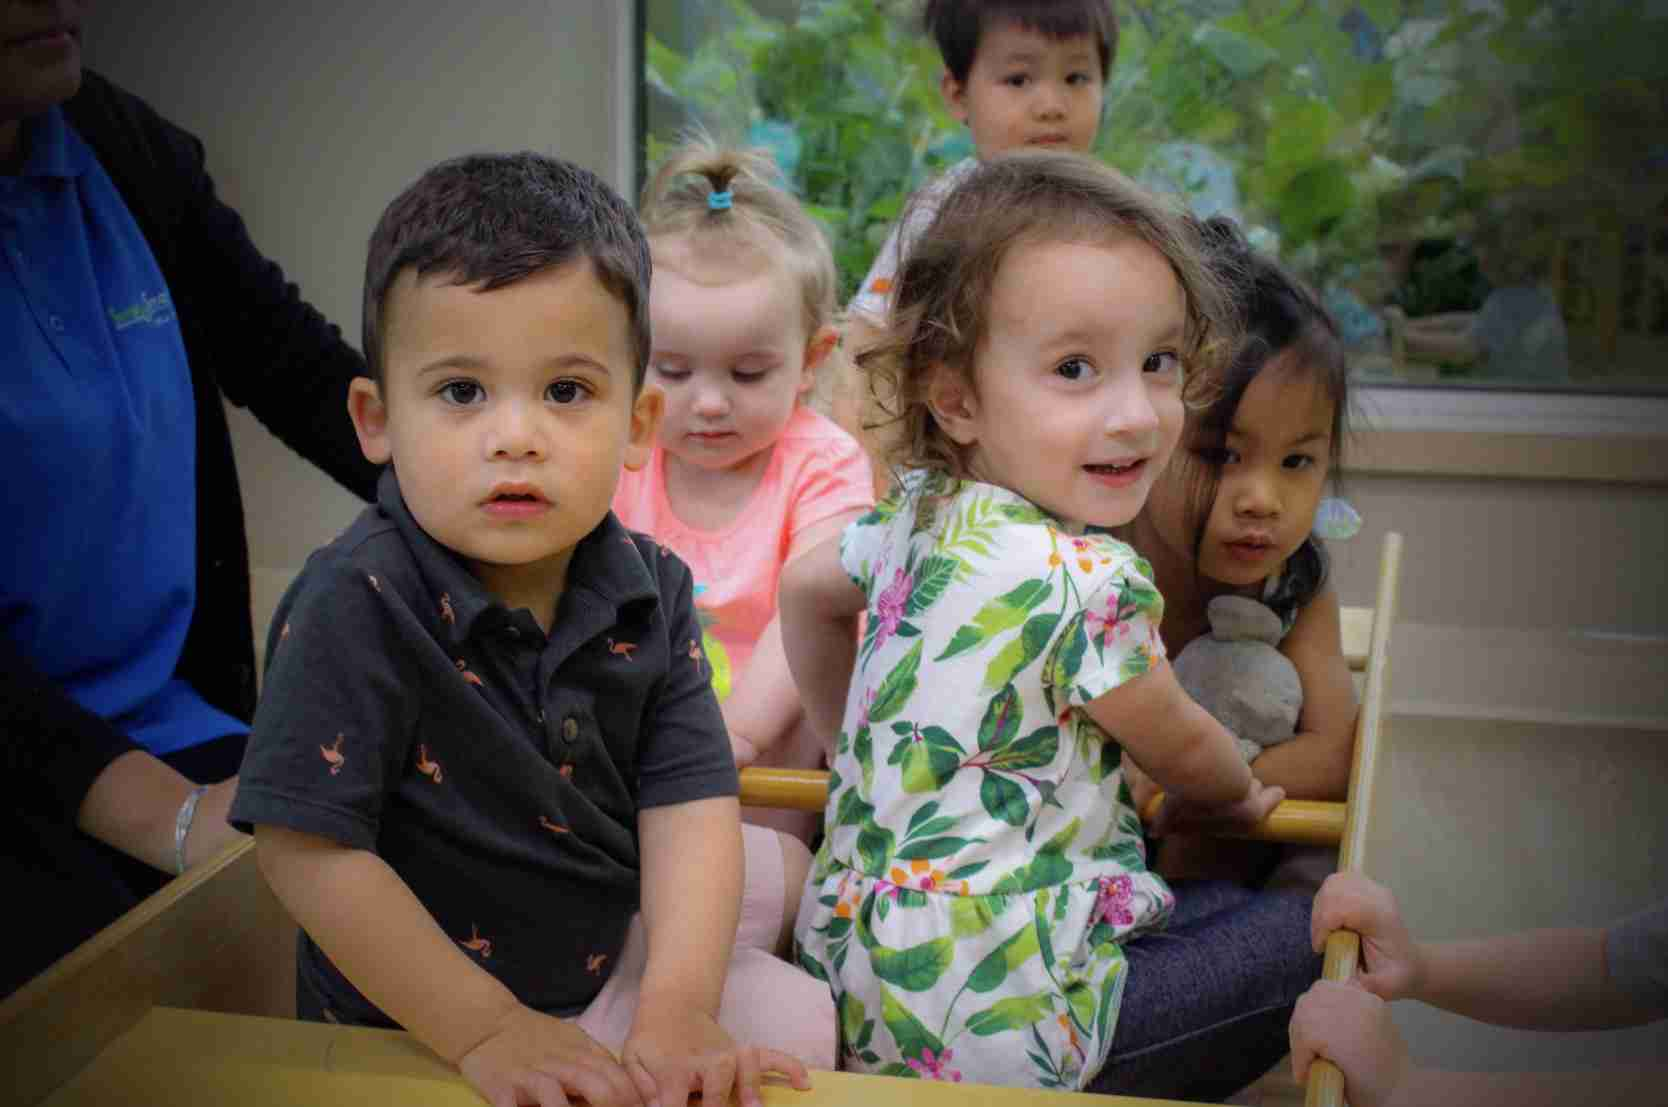 Little children playing on a cart